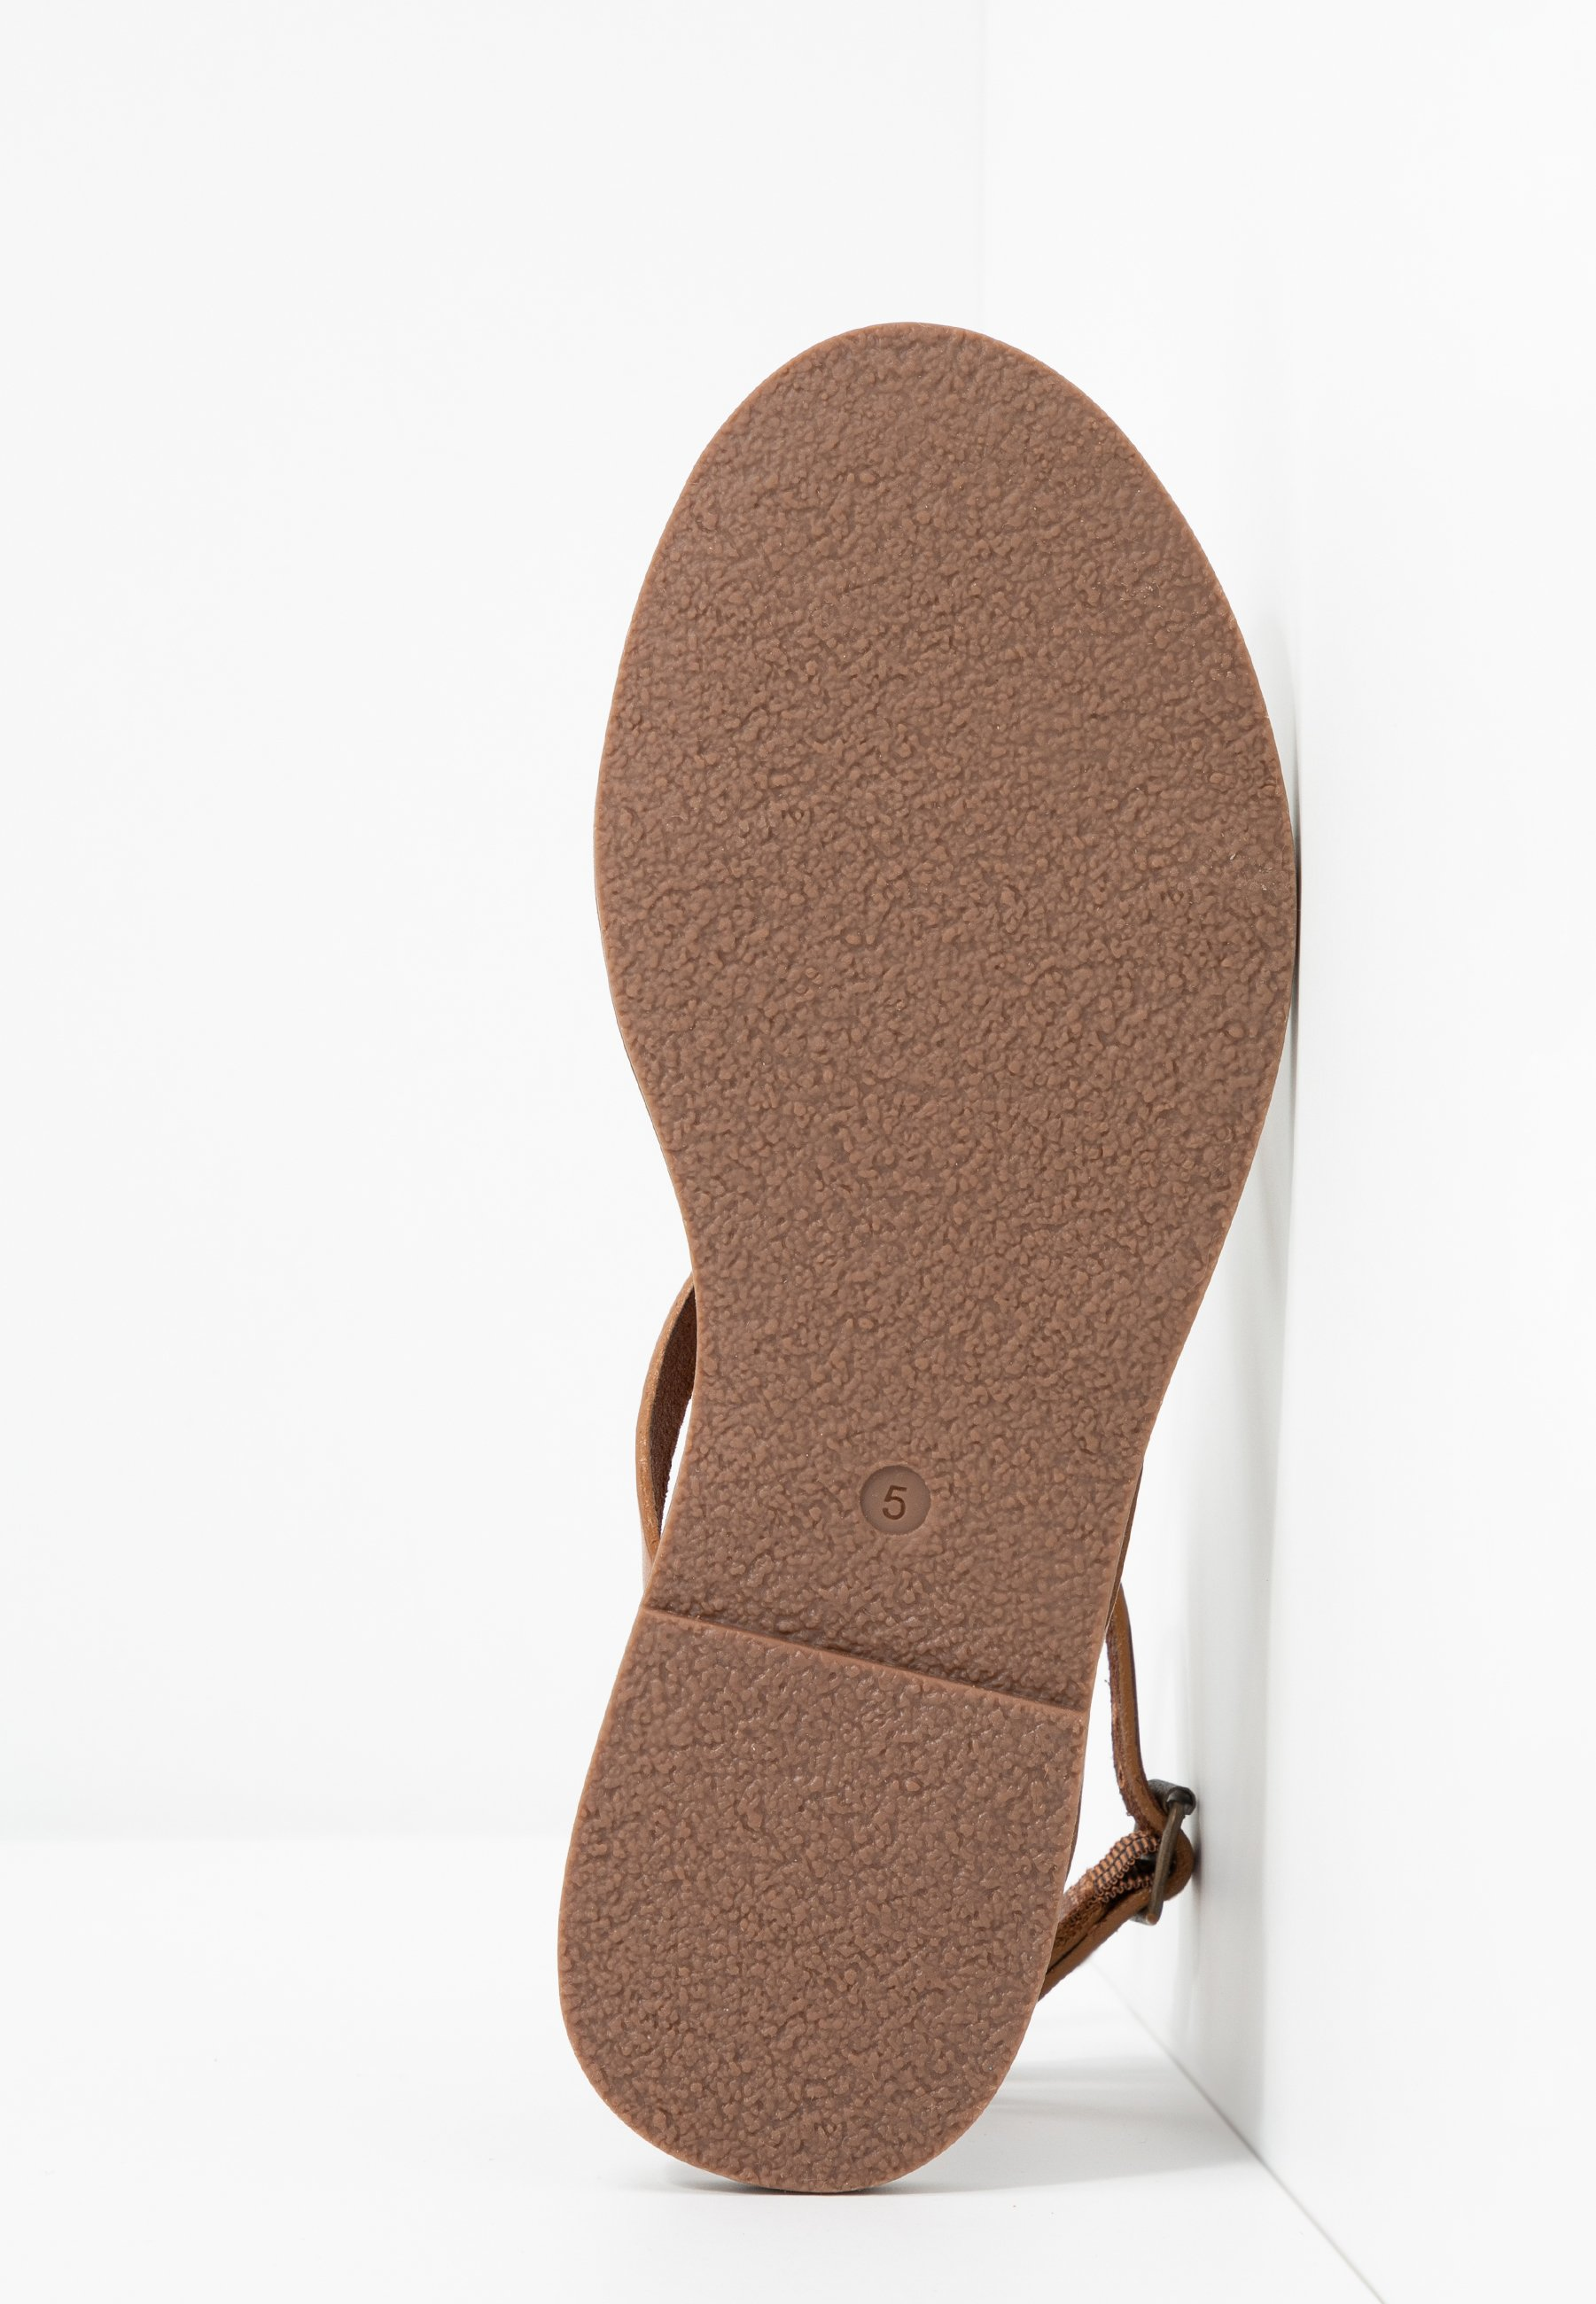 New Arrival Women's Shoes Madewell BOARDWALK SKINNY Sandals english saddle 7nyYVytUn